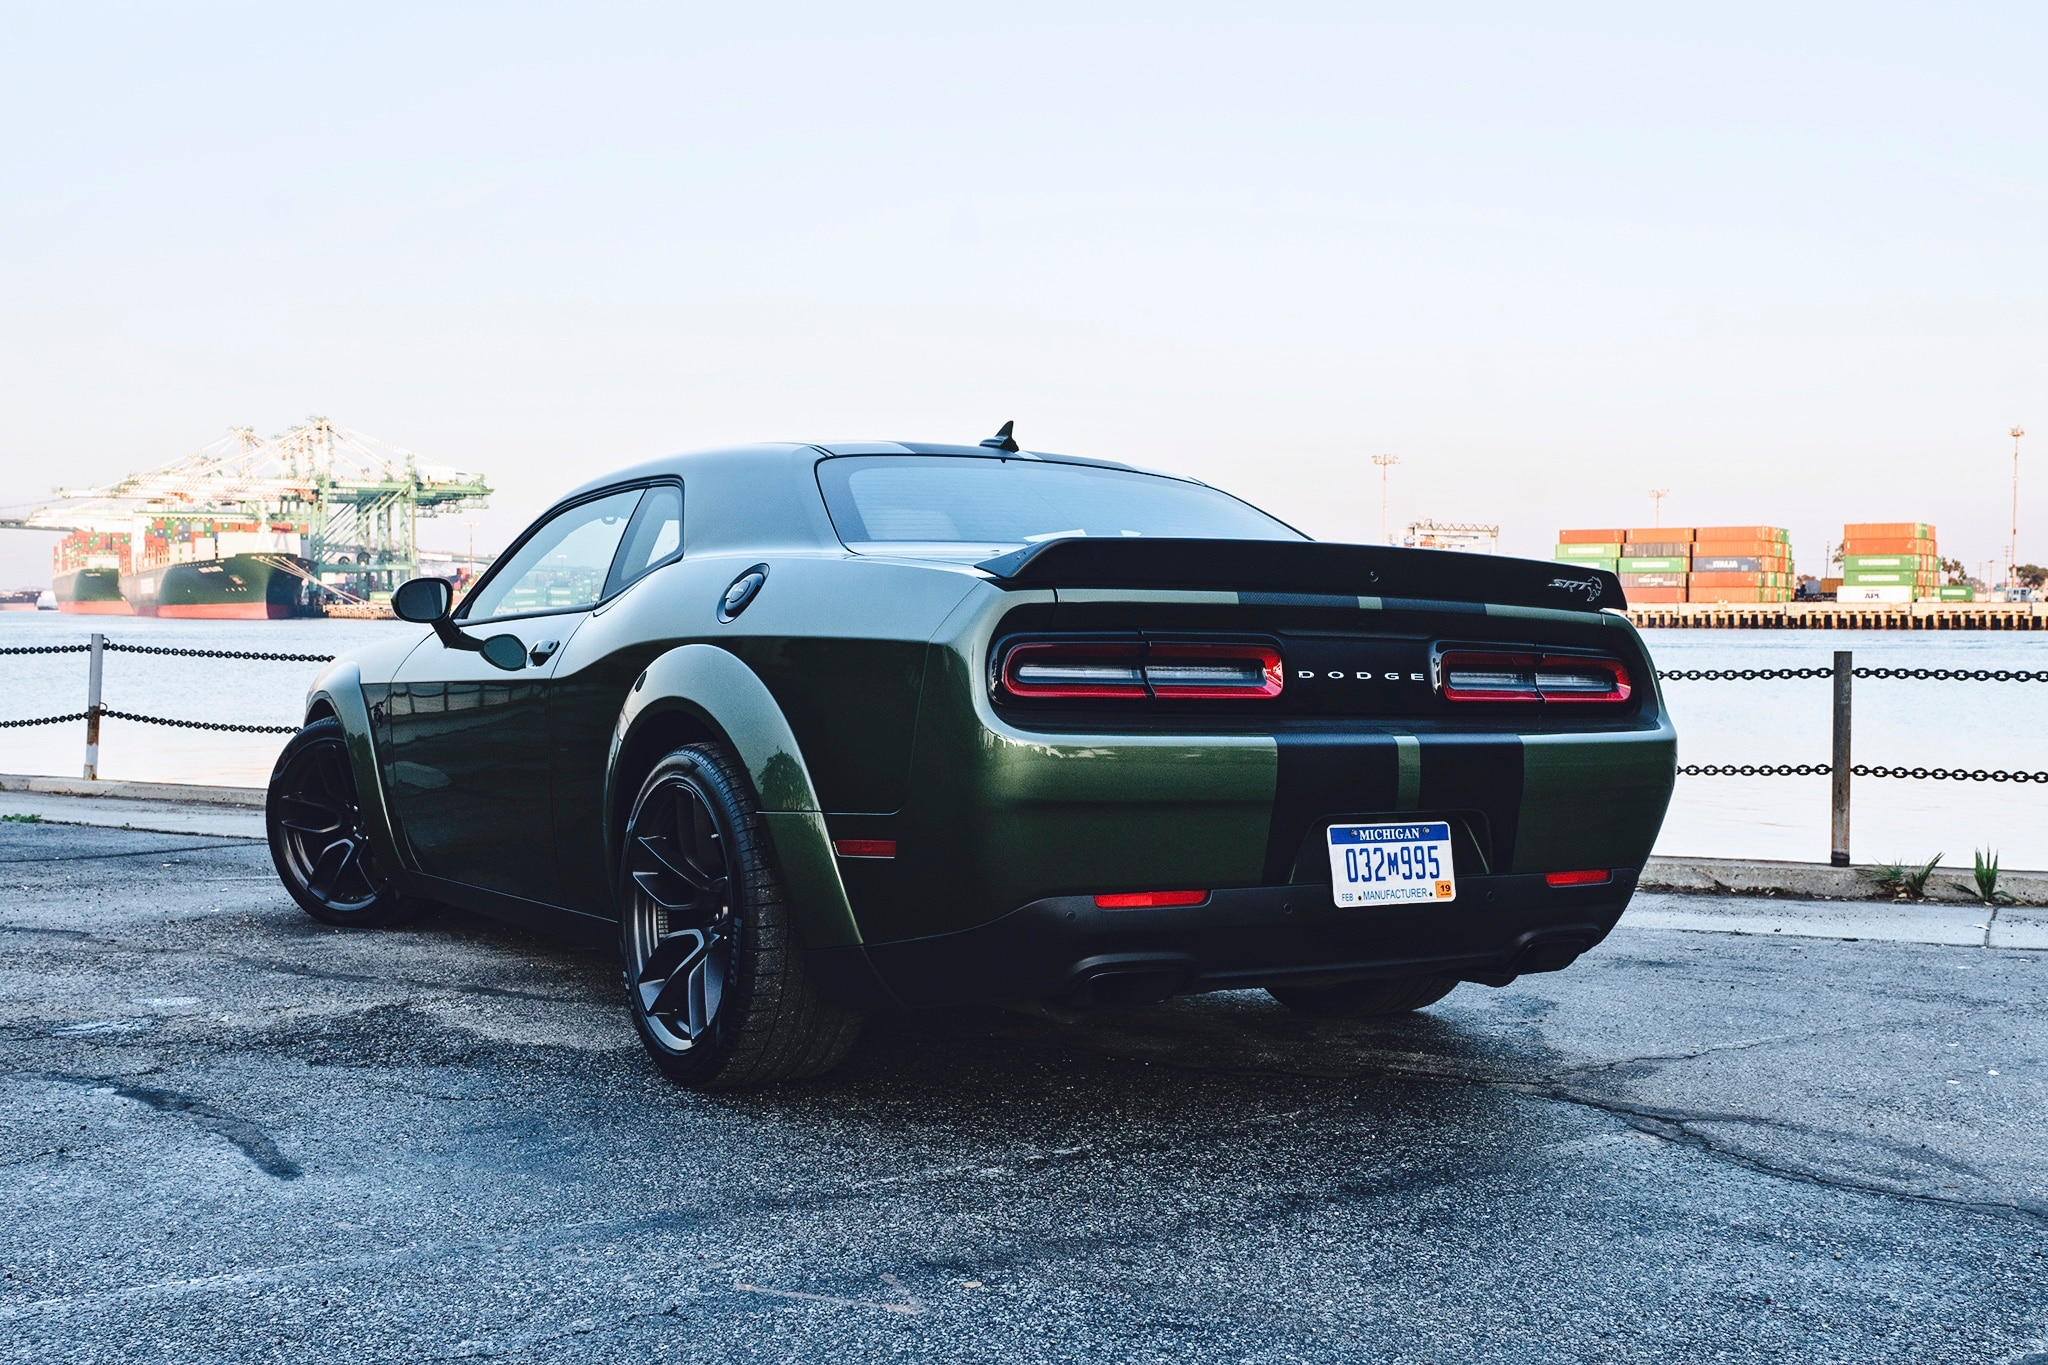 2019 Dodge Challenger SRT Hellcat Redeye Photo Gallery ...